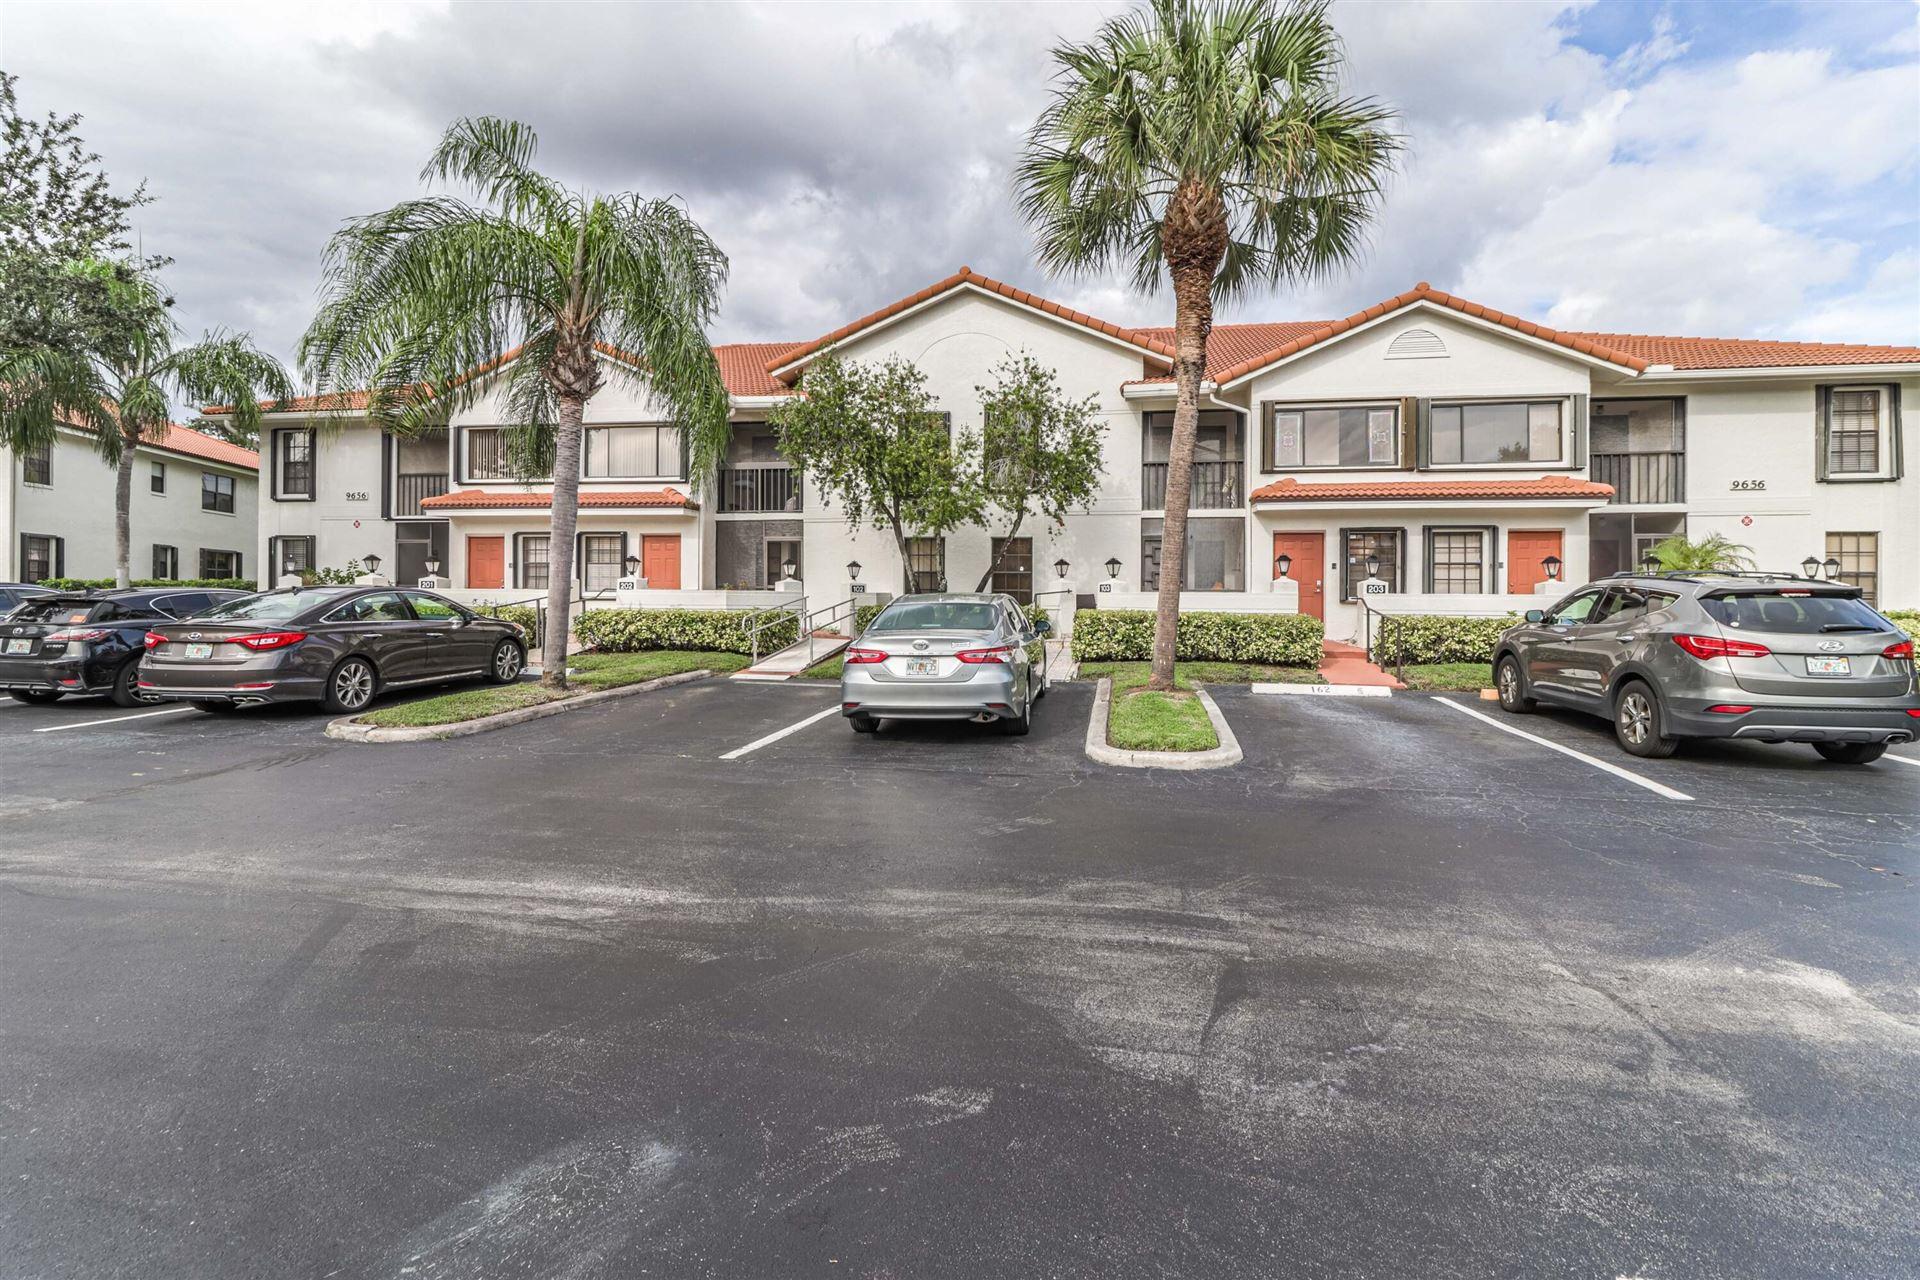 9656 Sills Drive E #102, Boynton Beach, FL 33437 - MLS#: RX-10748139